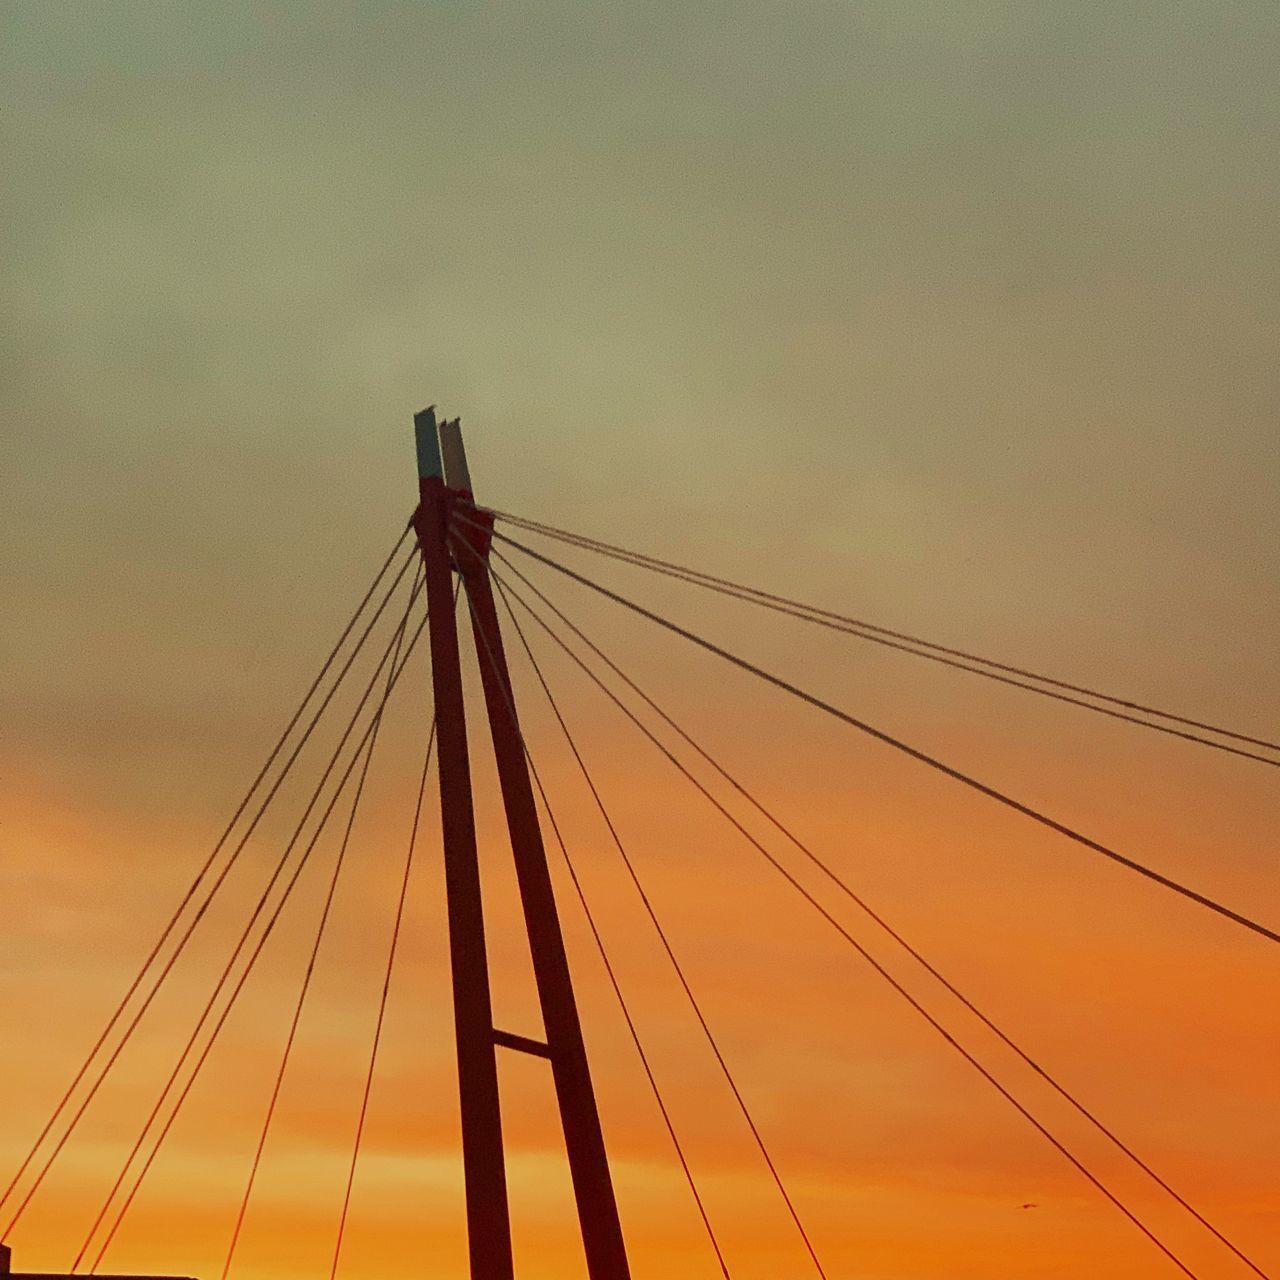 sky, sunset, cable, connection, transportation, no people, nature, bridge, cloud - sky, low angle view, architecture, orange color, outdoors, bridge - man made structure, built structure, dusk, cable-stayed bridge, suspension bridge, strength